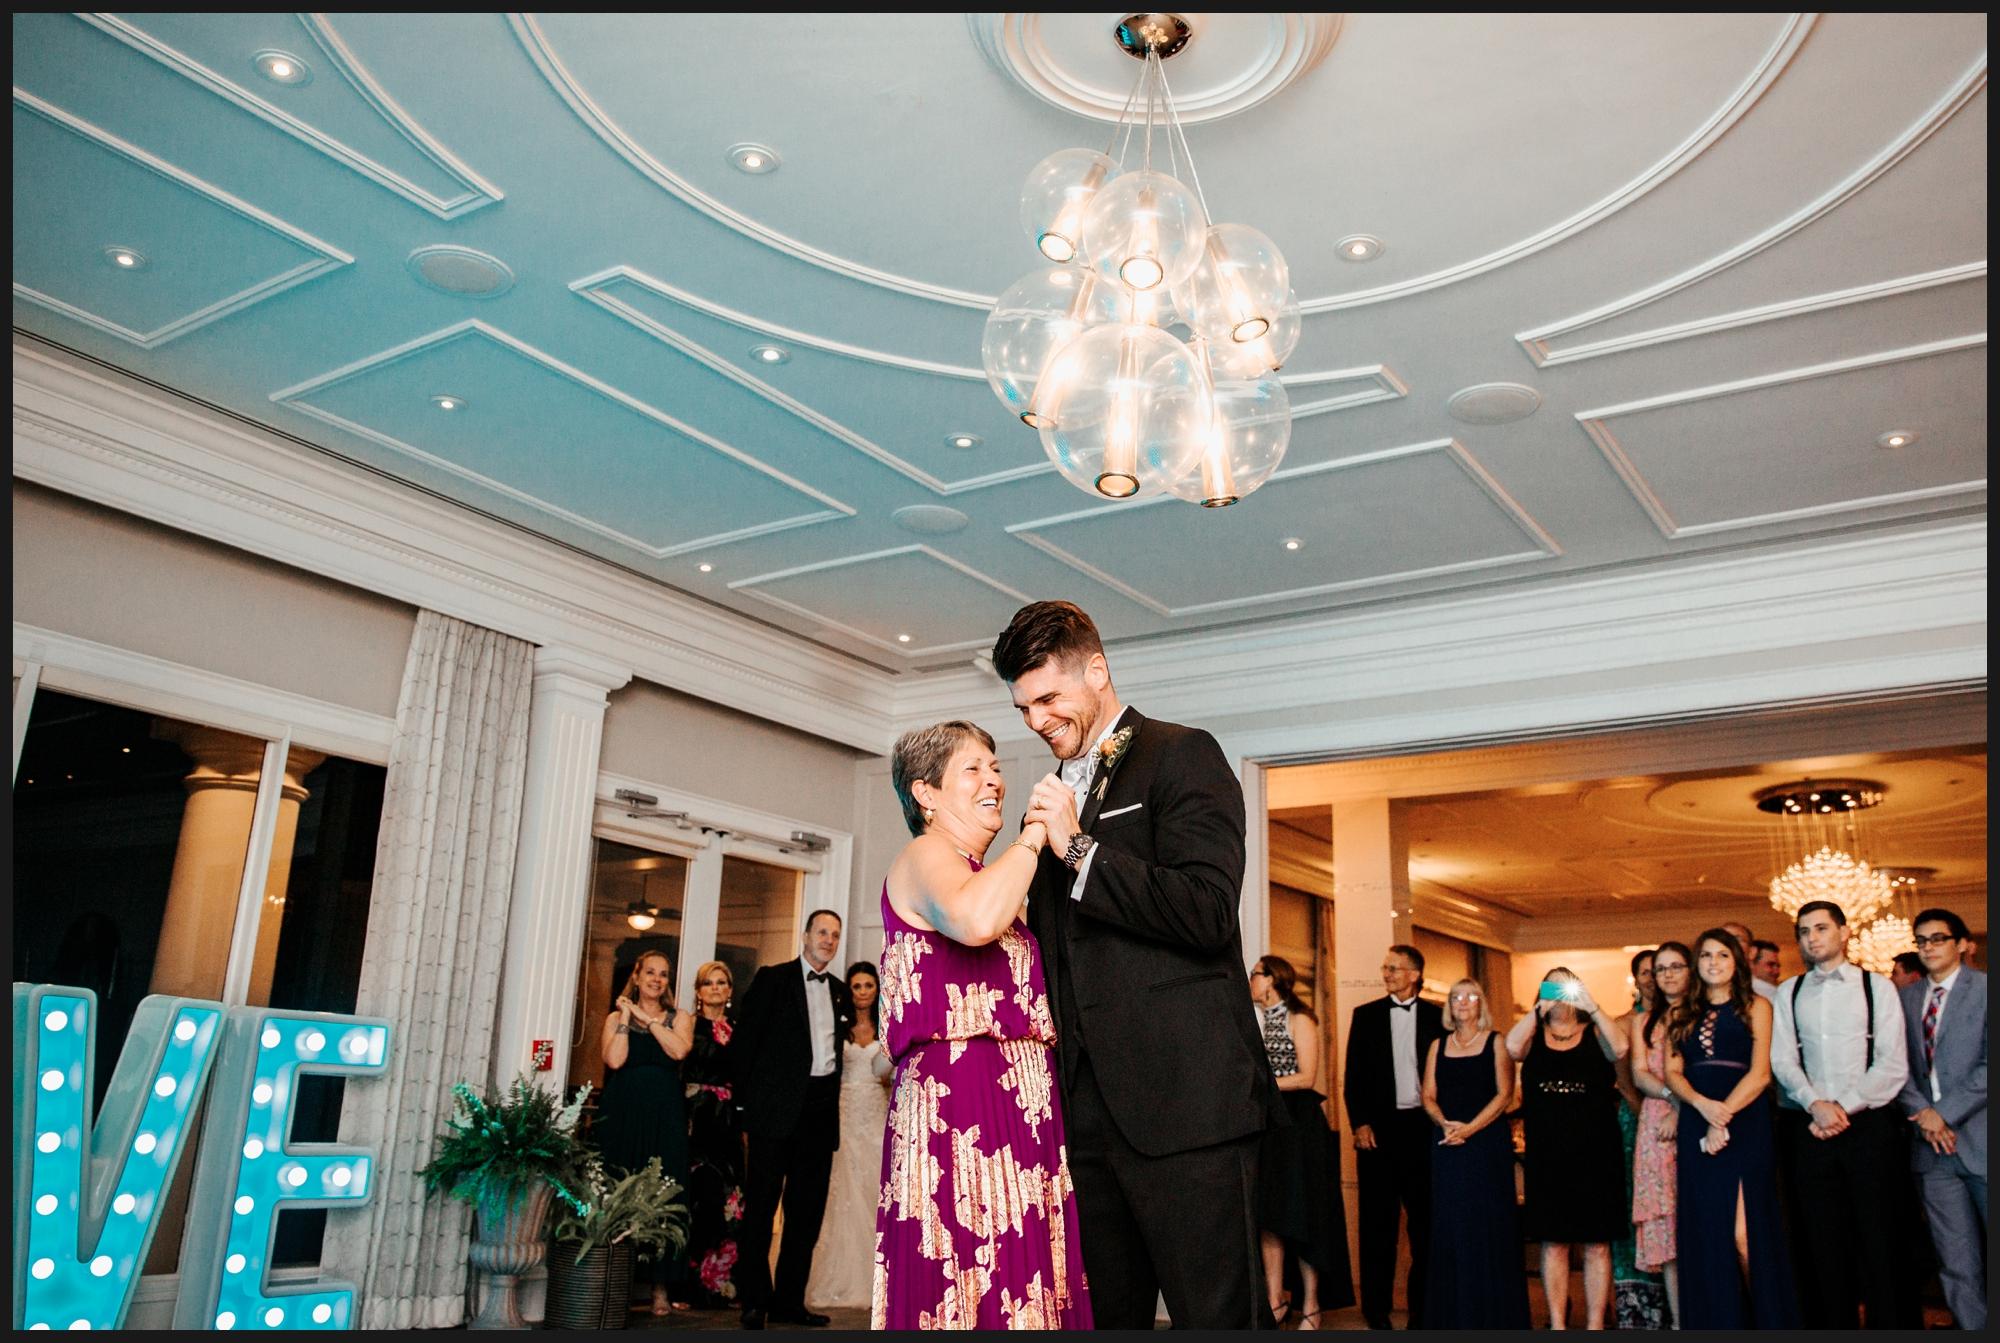 Orlando-Wedding-Photographer-destination-wedding-photographer-florida-wedding-photographer-hawaii-wedding-photographer_0255.jpg